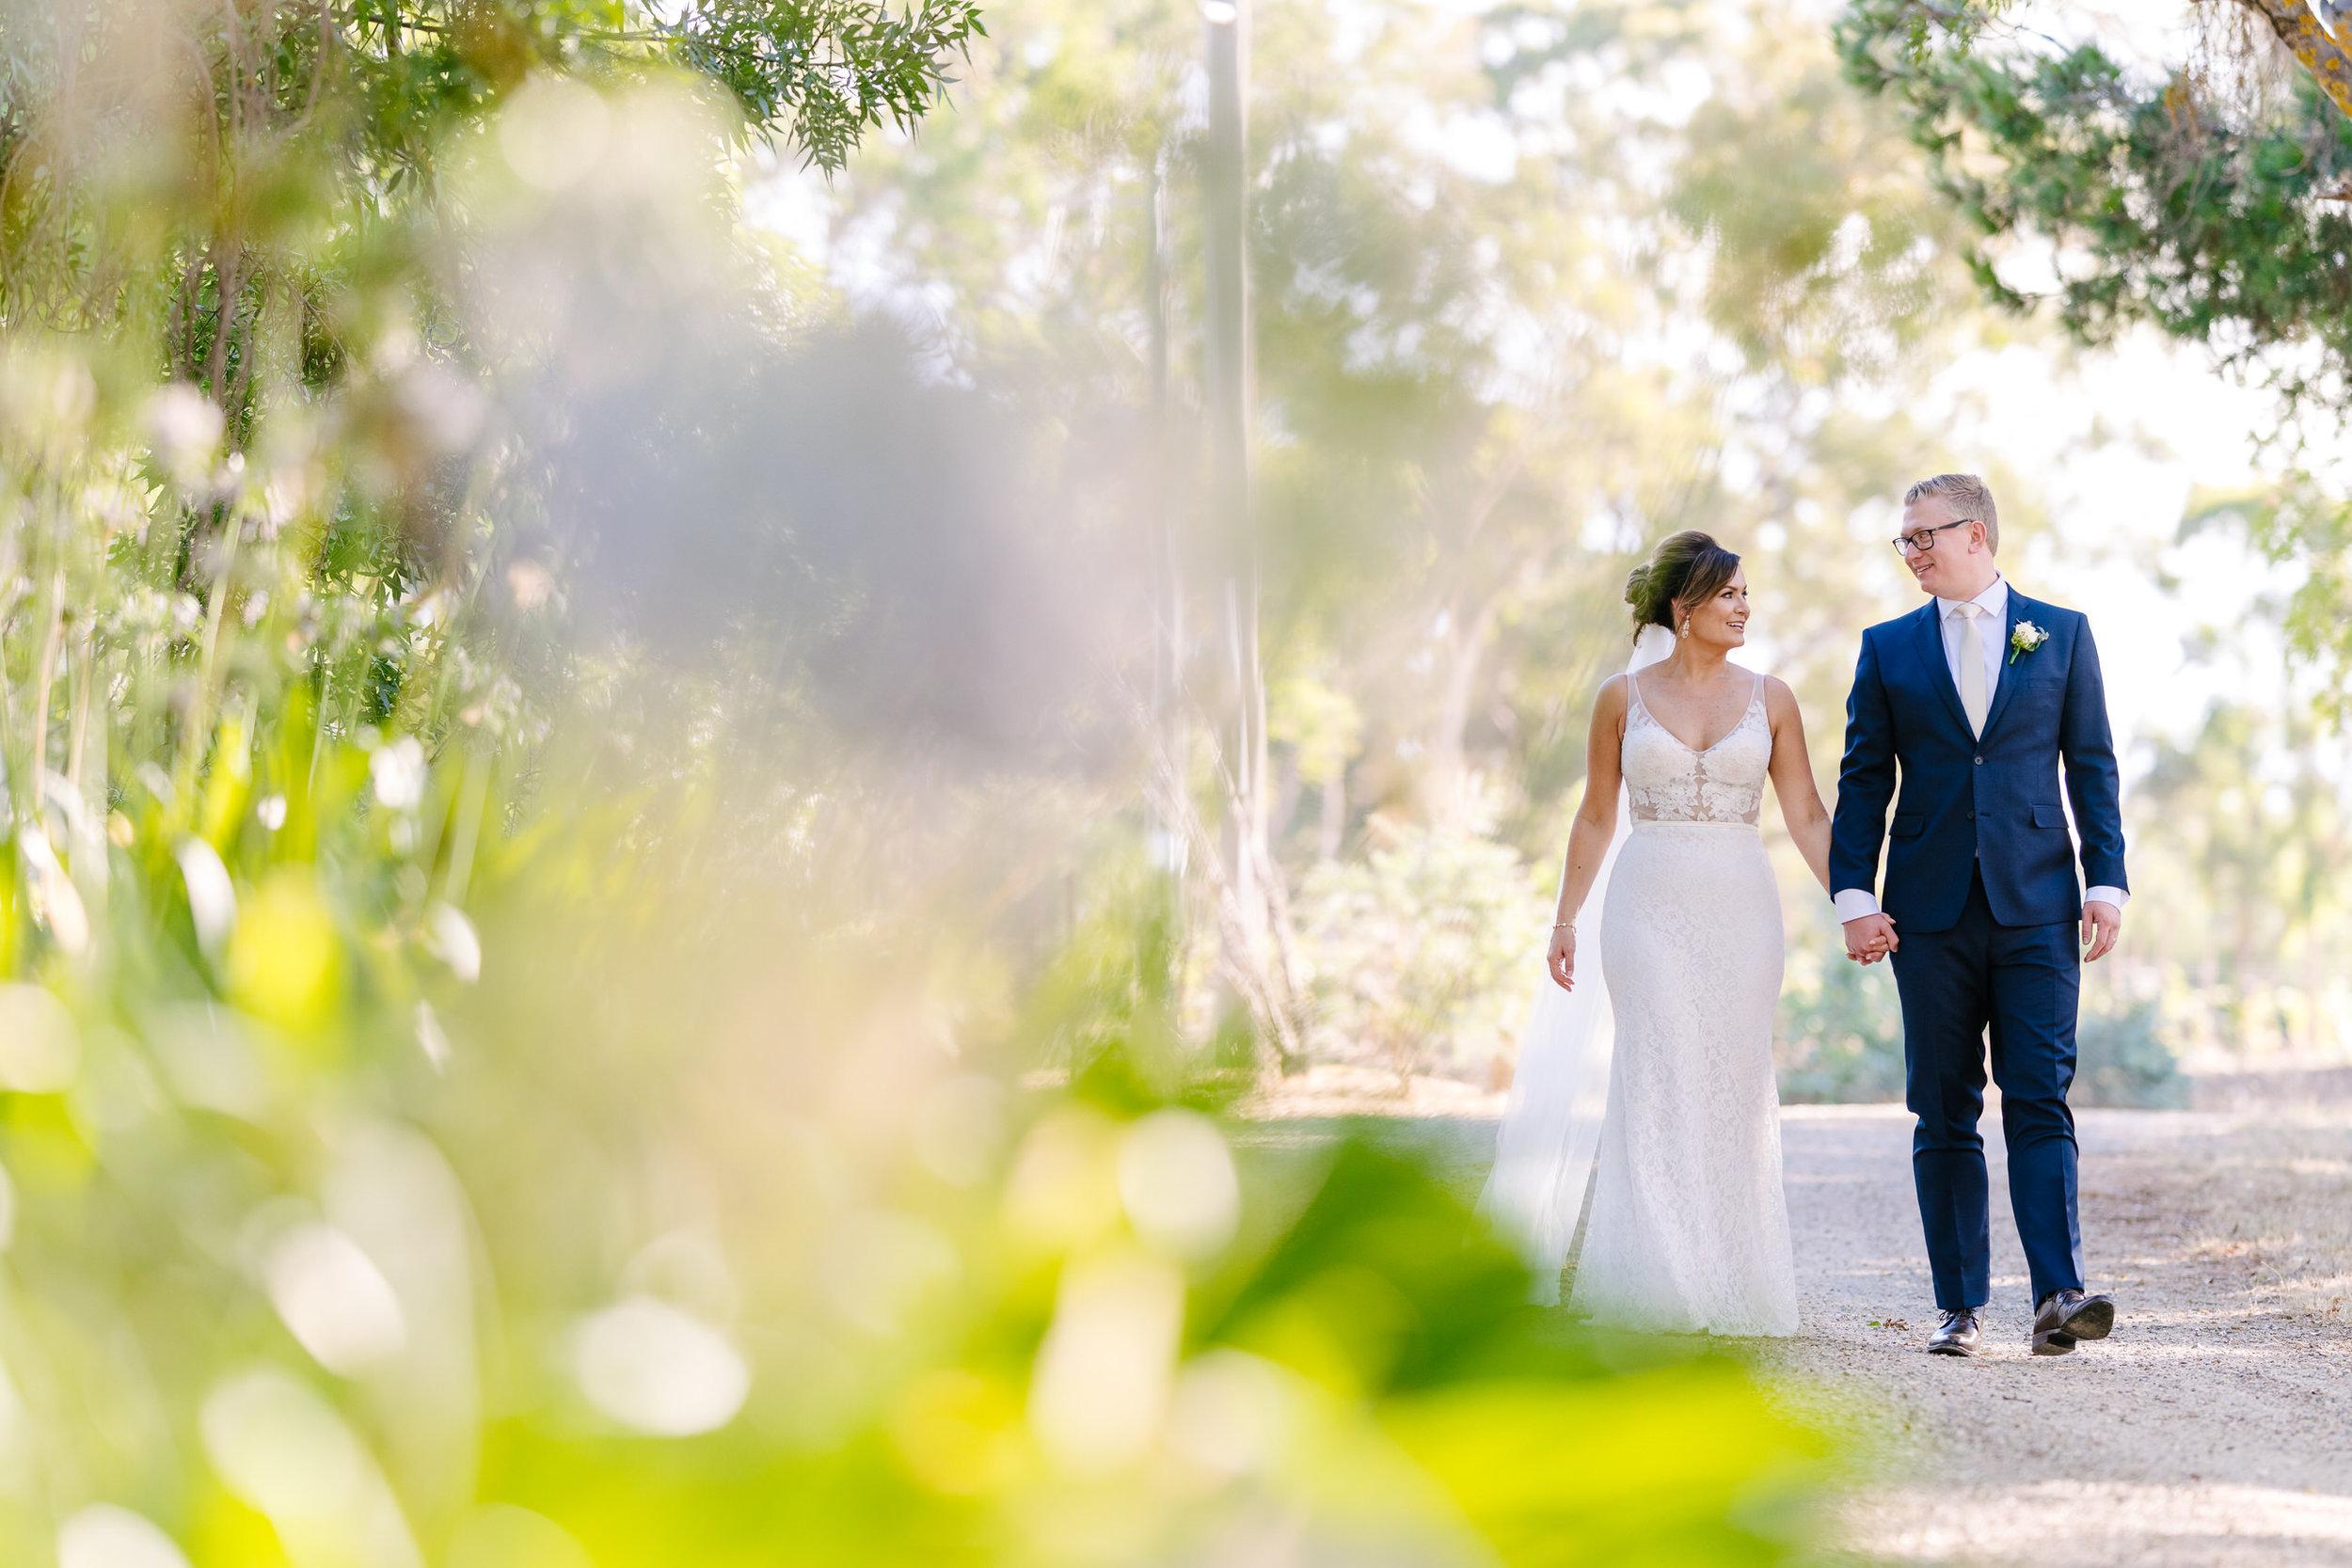 Justin_And_Jim_Photography_Chateau_Dore_Bendigo_Wedding52.JPG